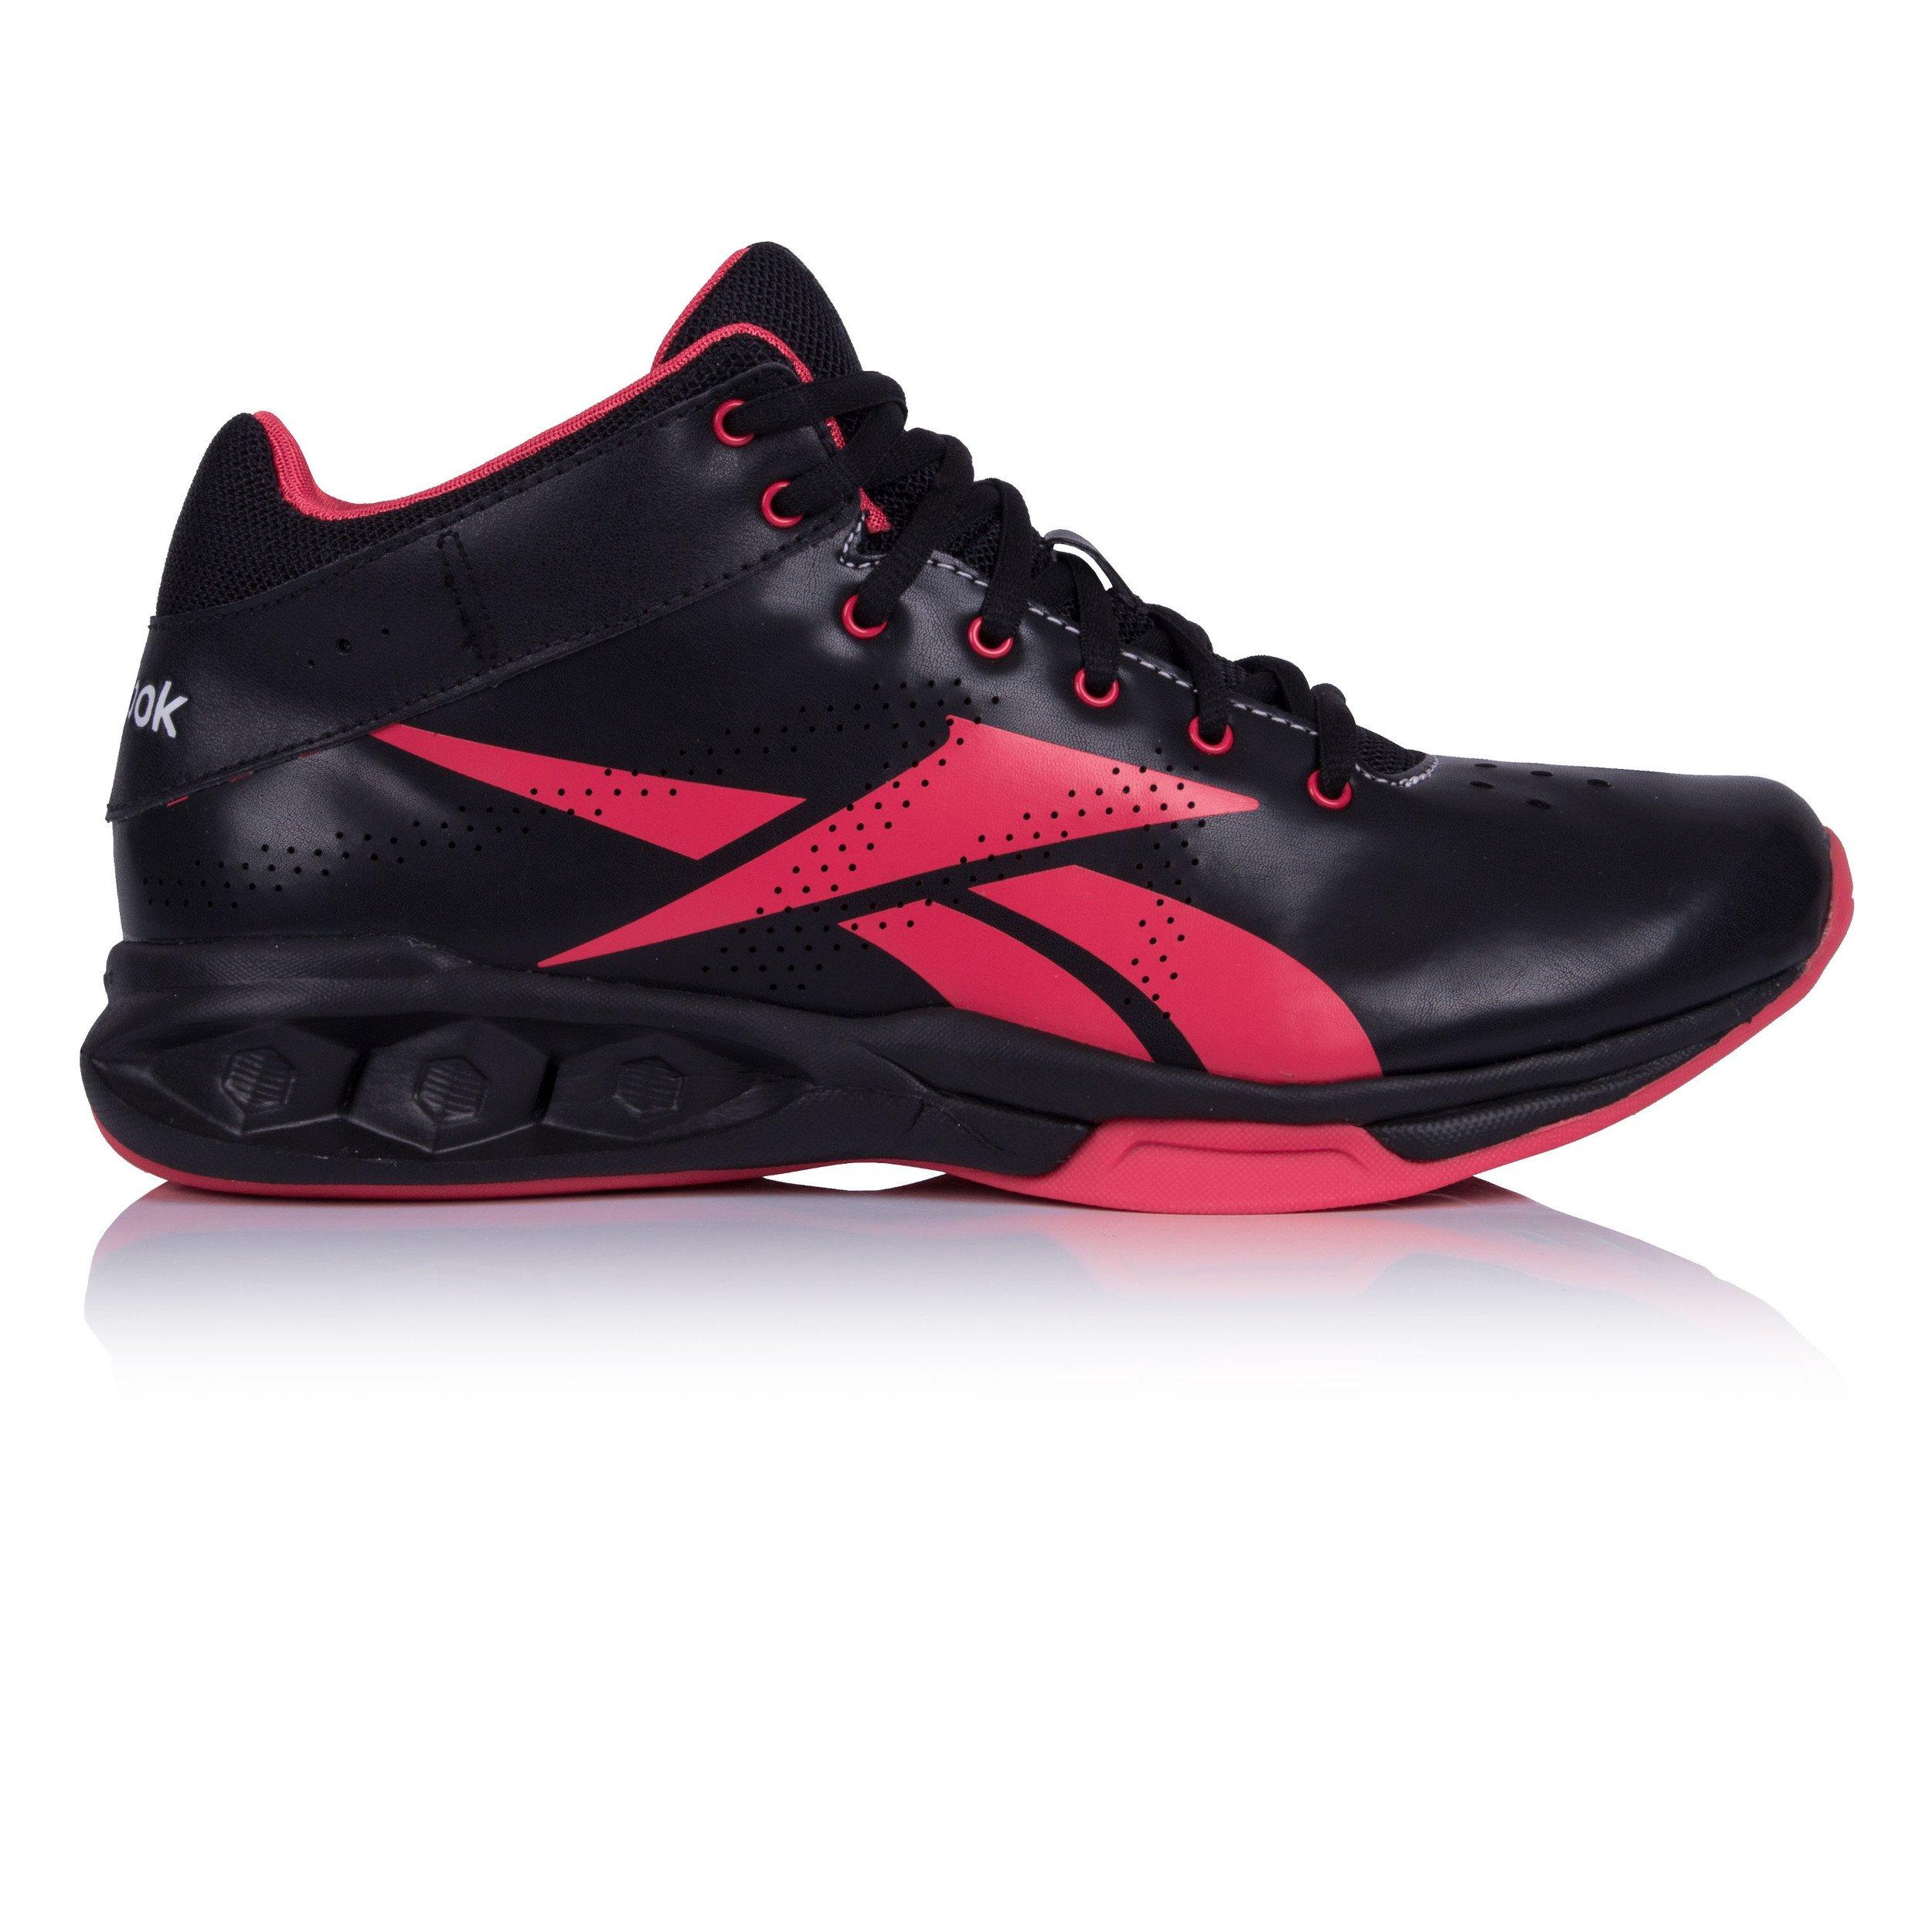 Reebok Hexride Intensity Mid Womens Running Sneakers, Size 5 Black